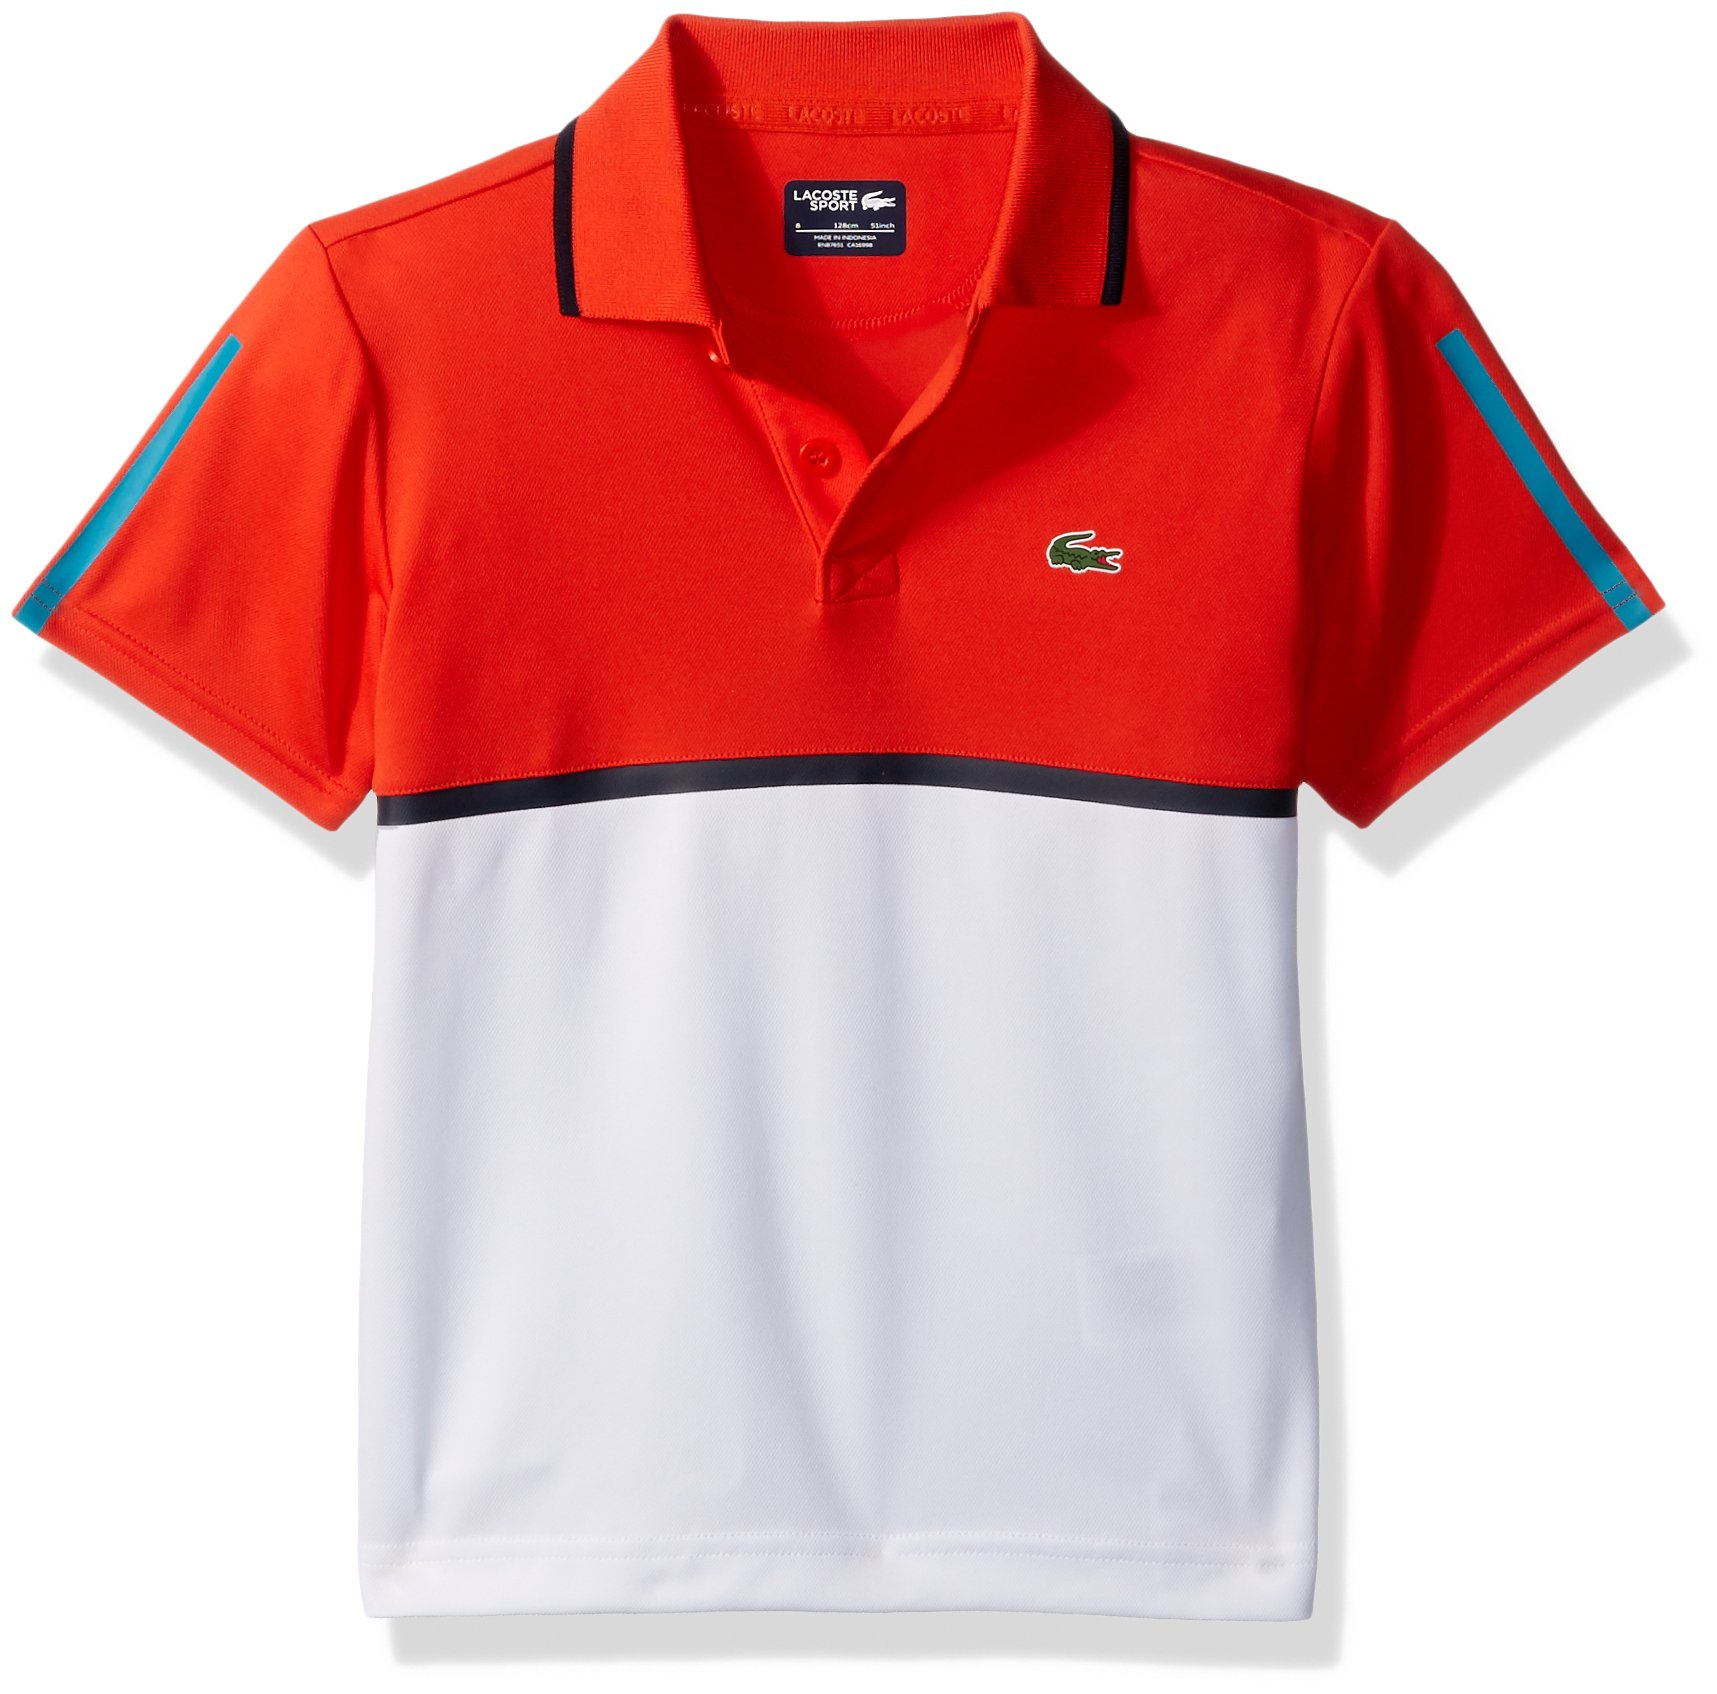 432fdf018532ad Galleon - Lacoste Big Boys  Sport Colorblock UltraDry Polo Shirt ...